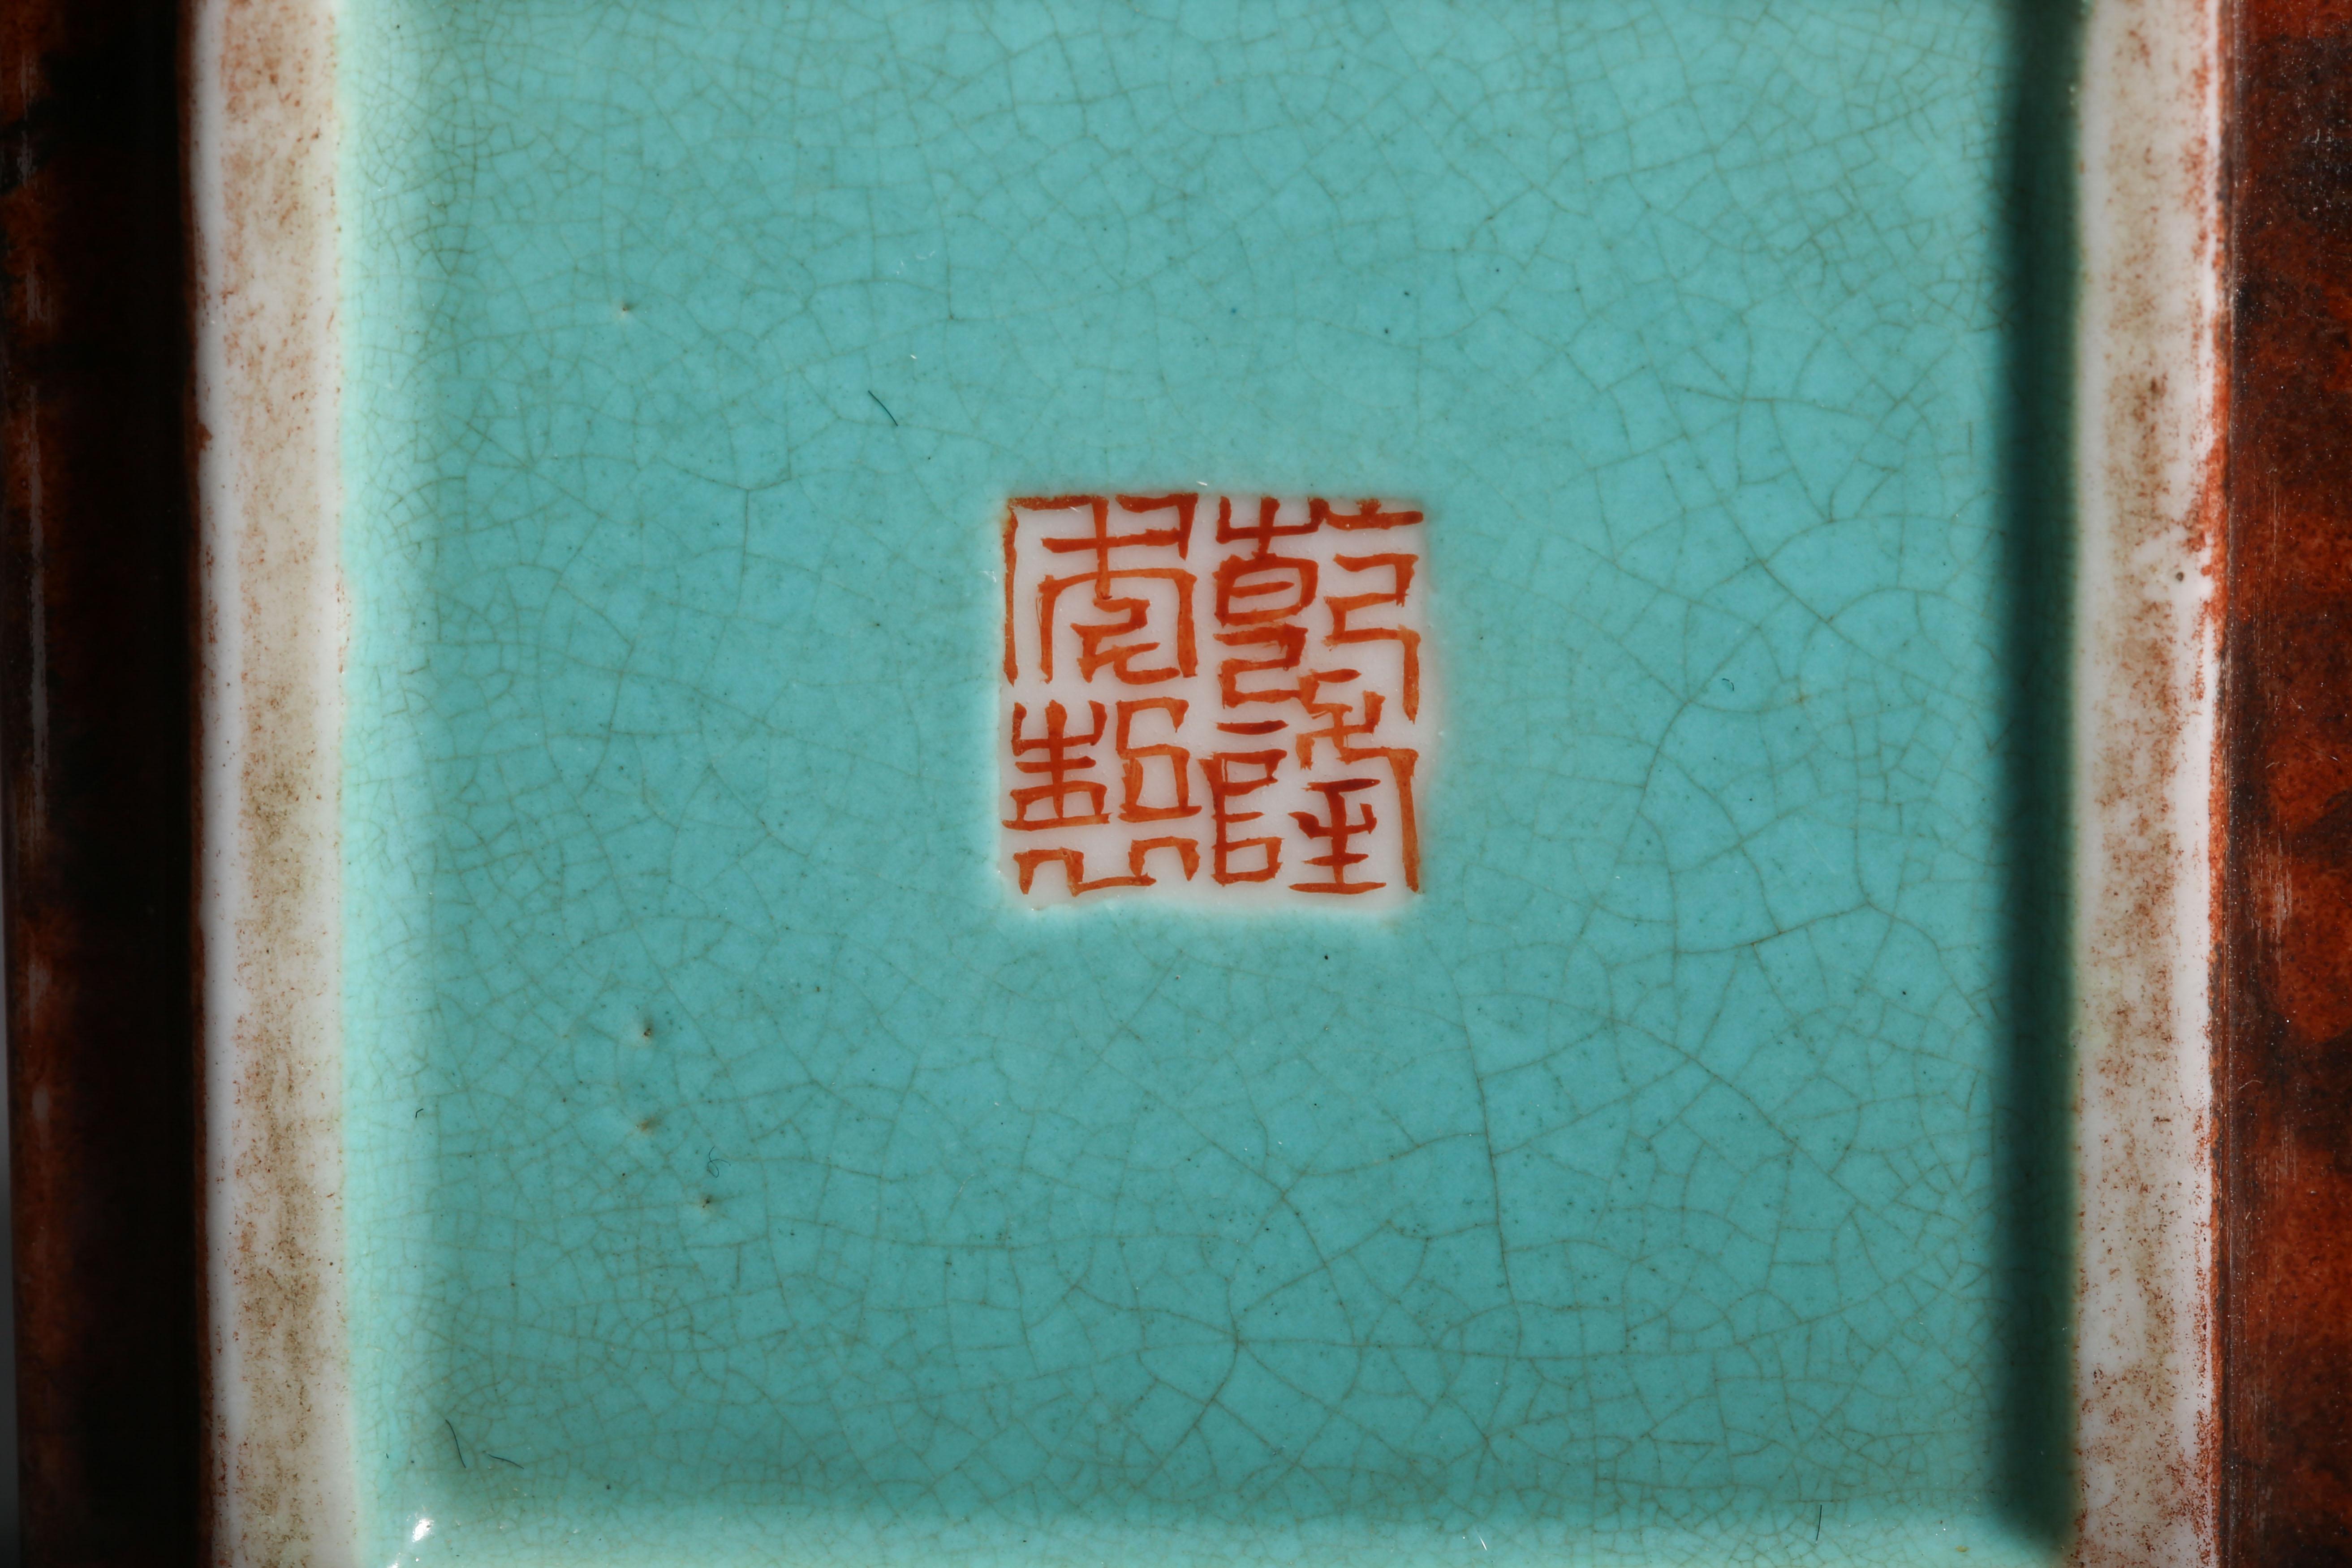 SQUARE FORM VASE, QIANLONG QING DYNASTY, CHINA - Image 9 of 10